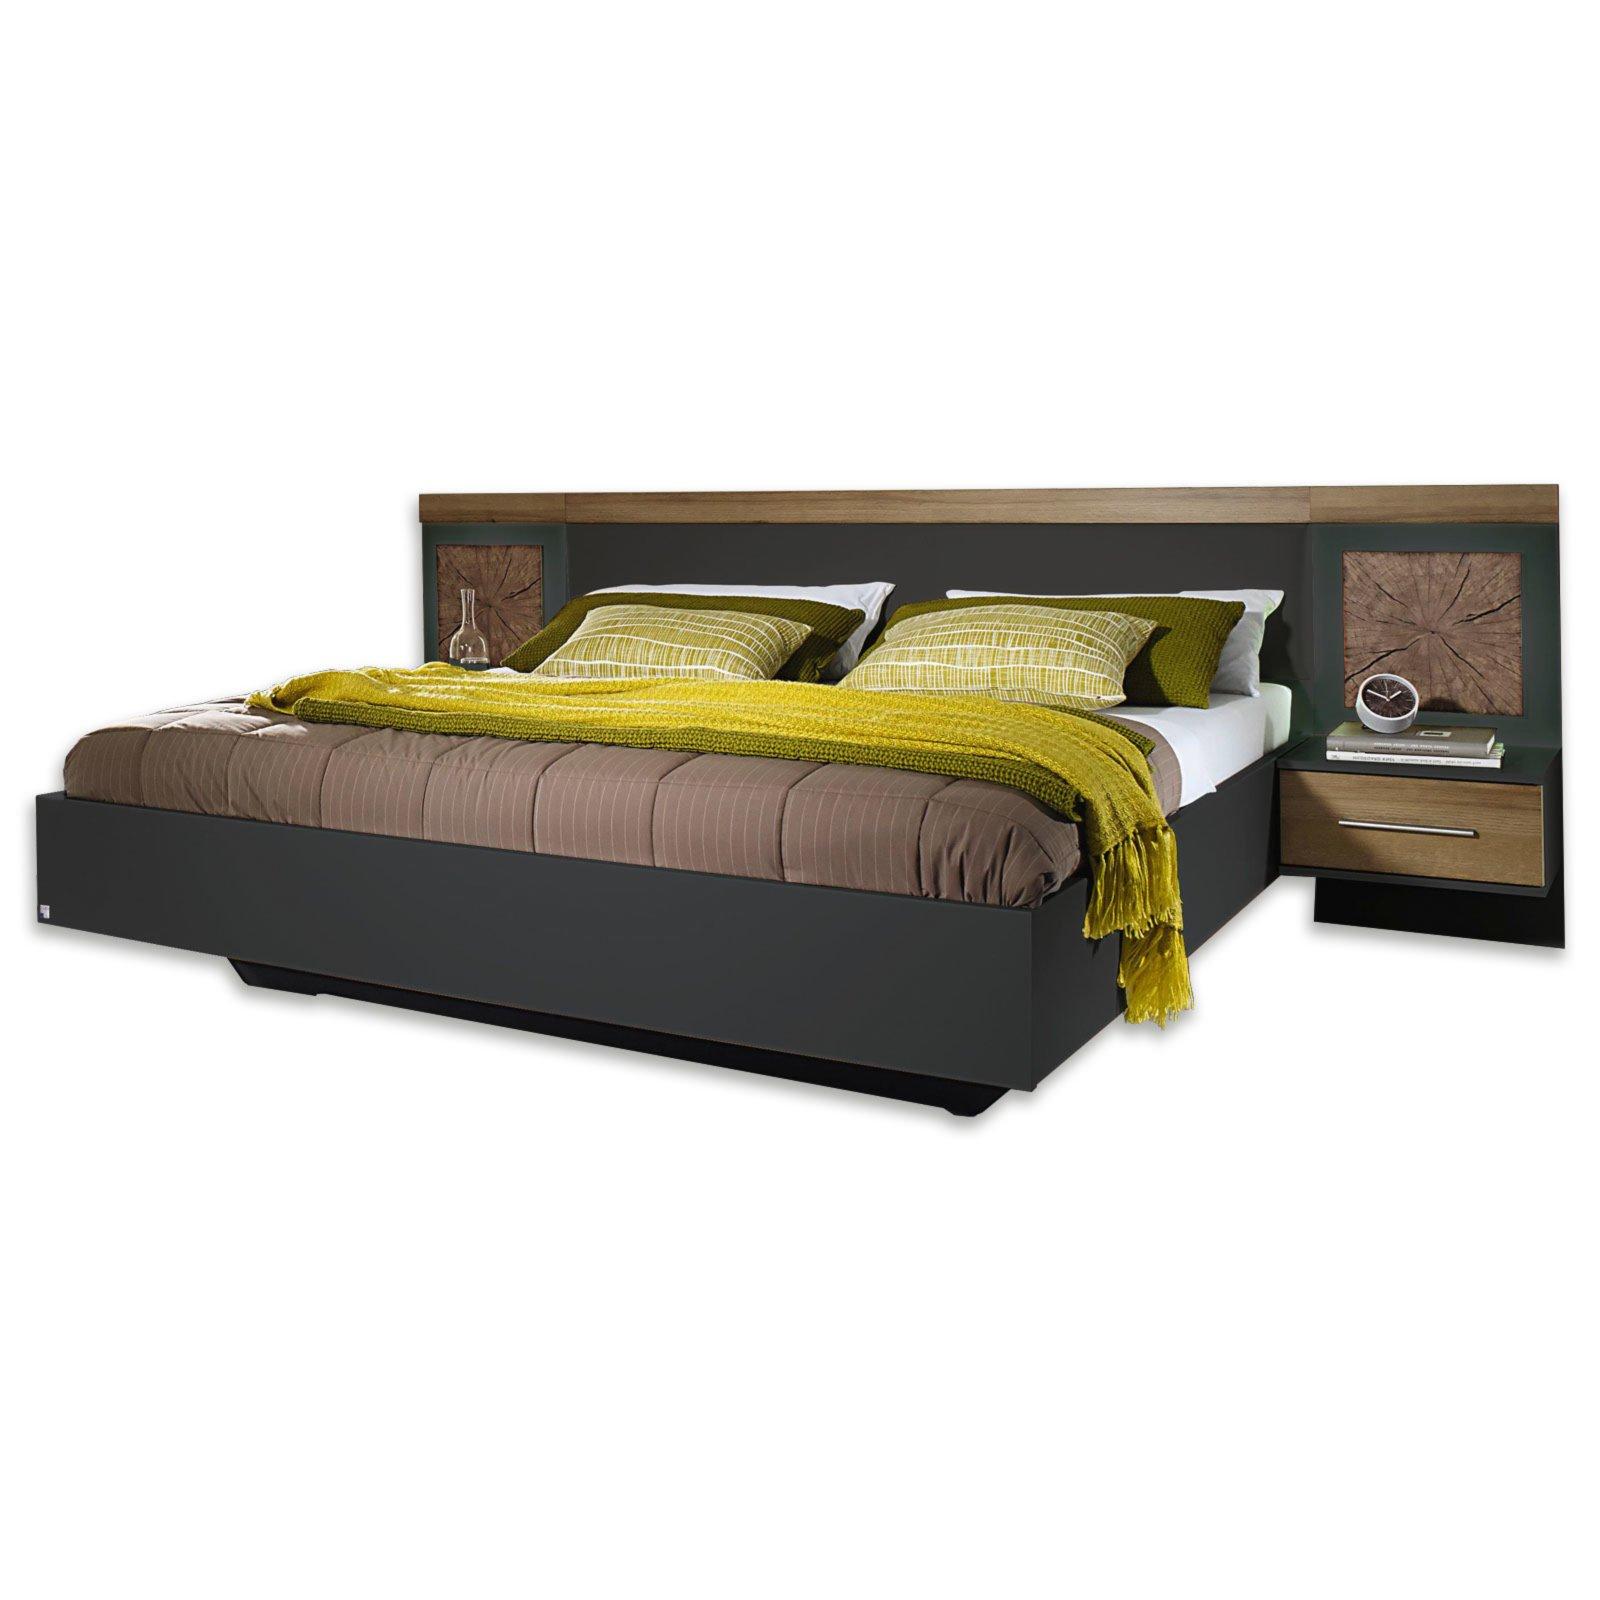 bettanlage kirchberg eiche riviera hirnholz 180x200 cm bettgestelle betten m bel roller. Black Bedroom Furniture Sets. Home Design Ideas